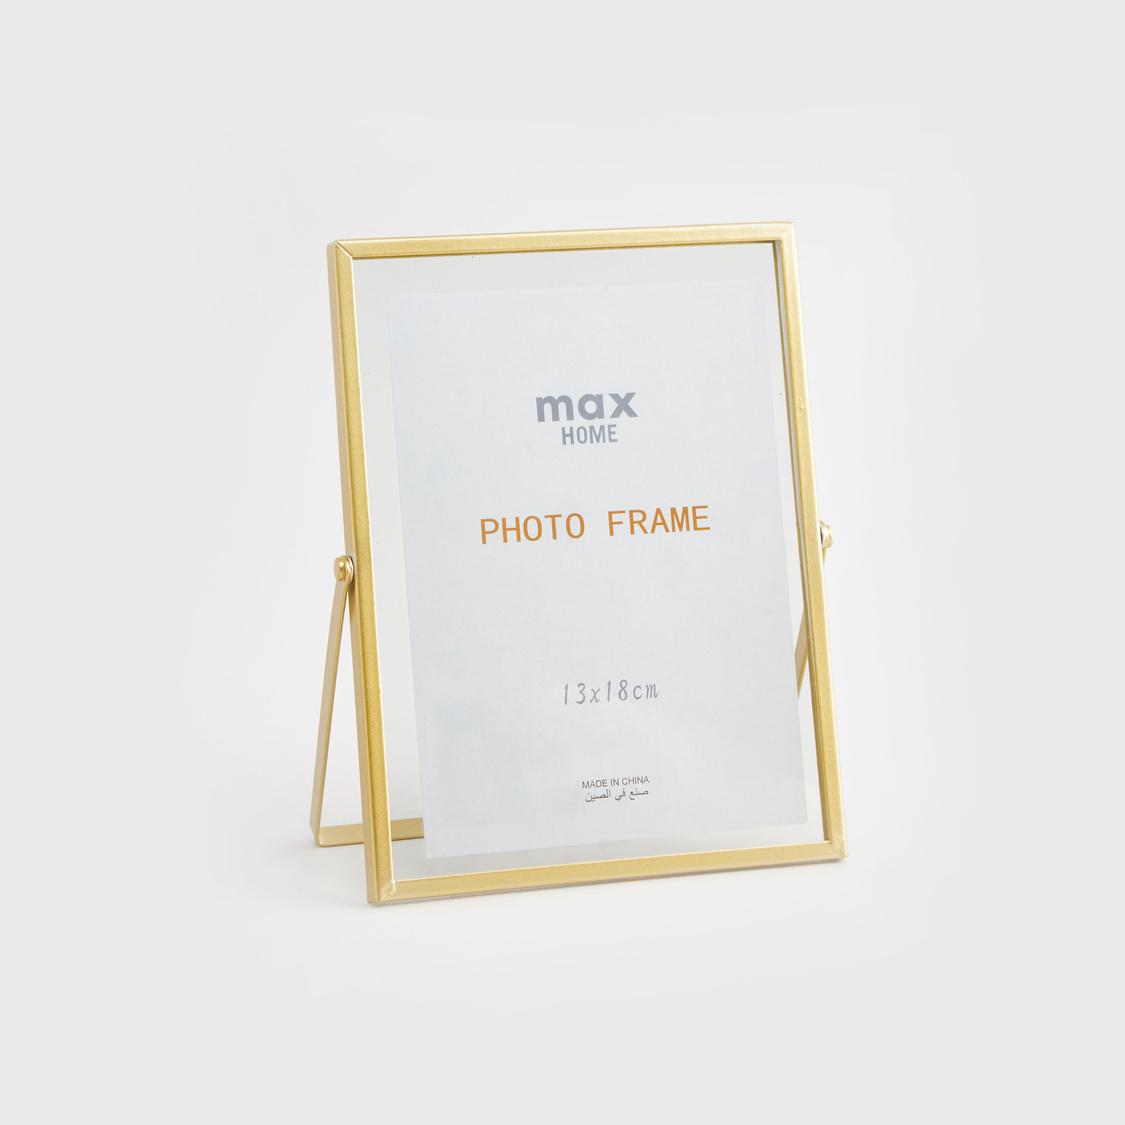 Square Shaped Photo Frame - 13x18 cms